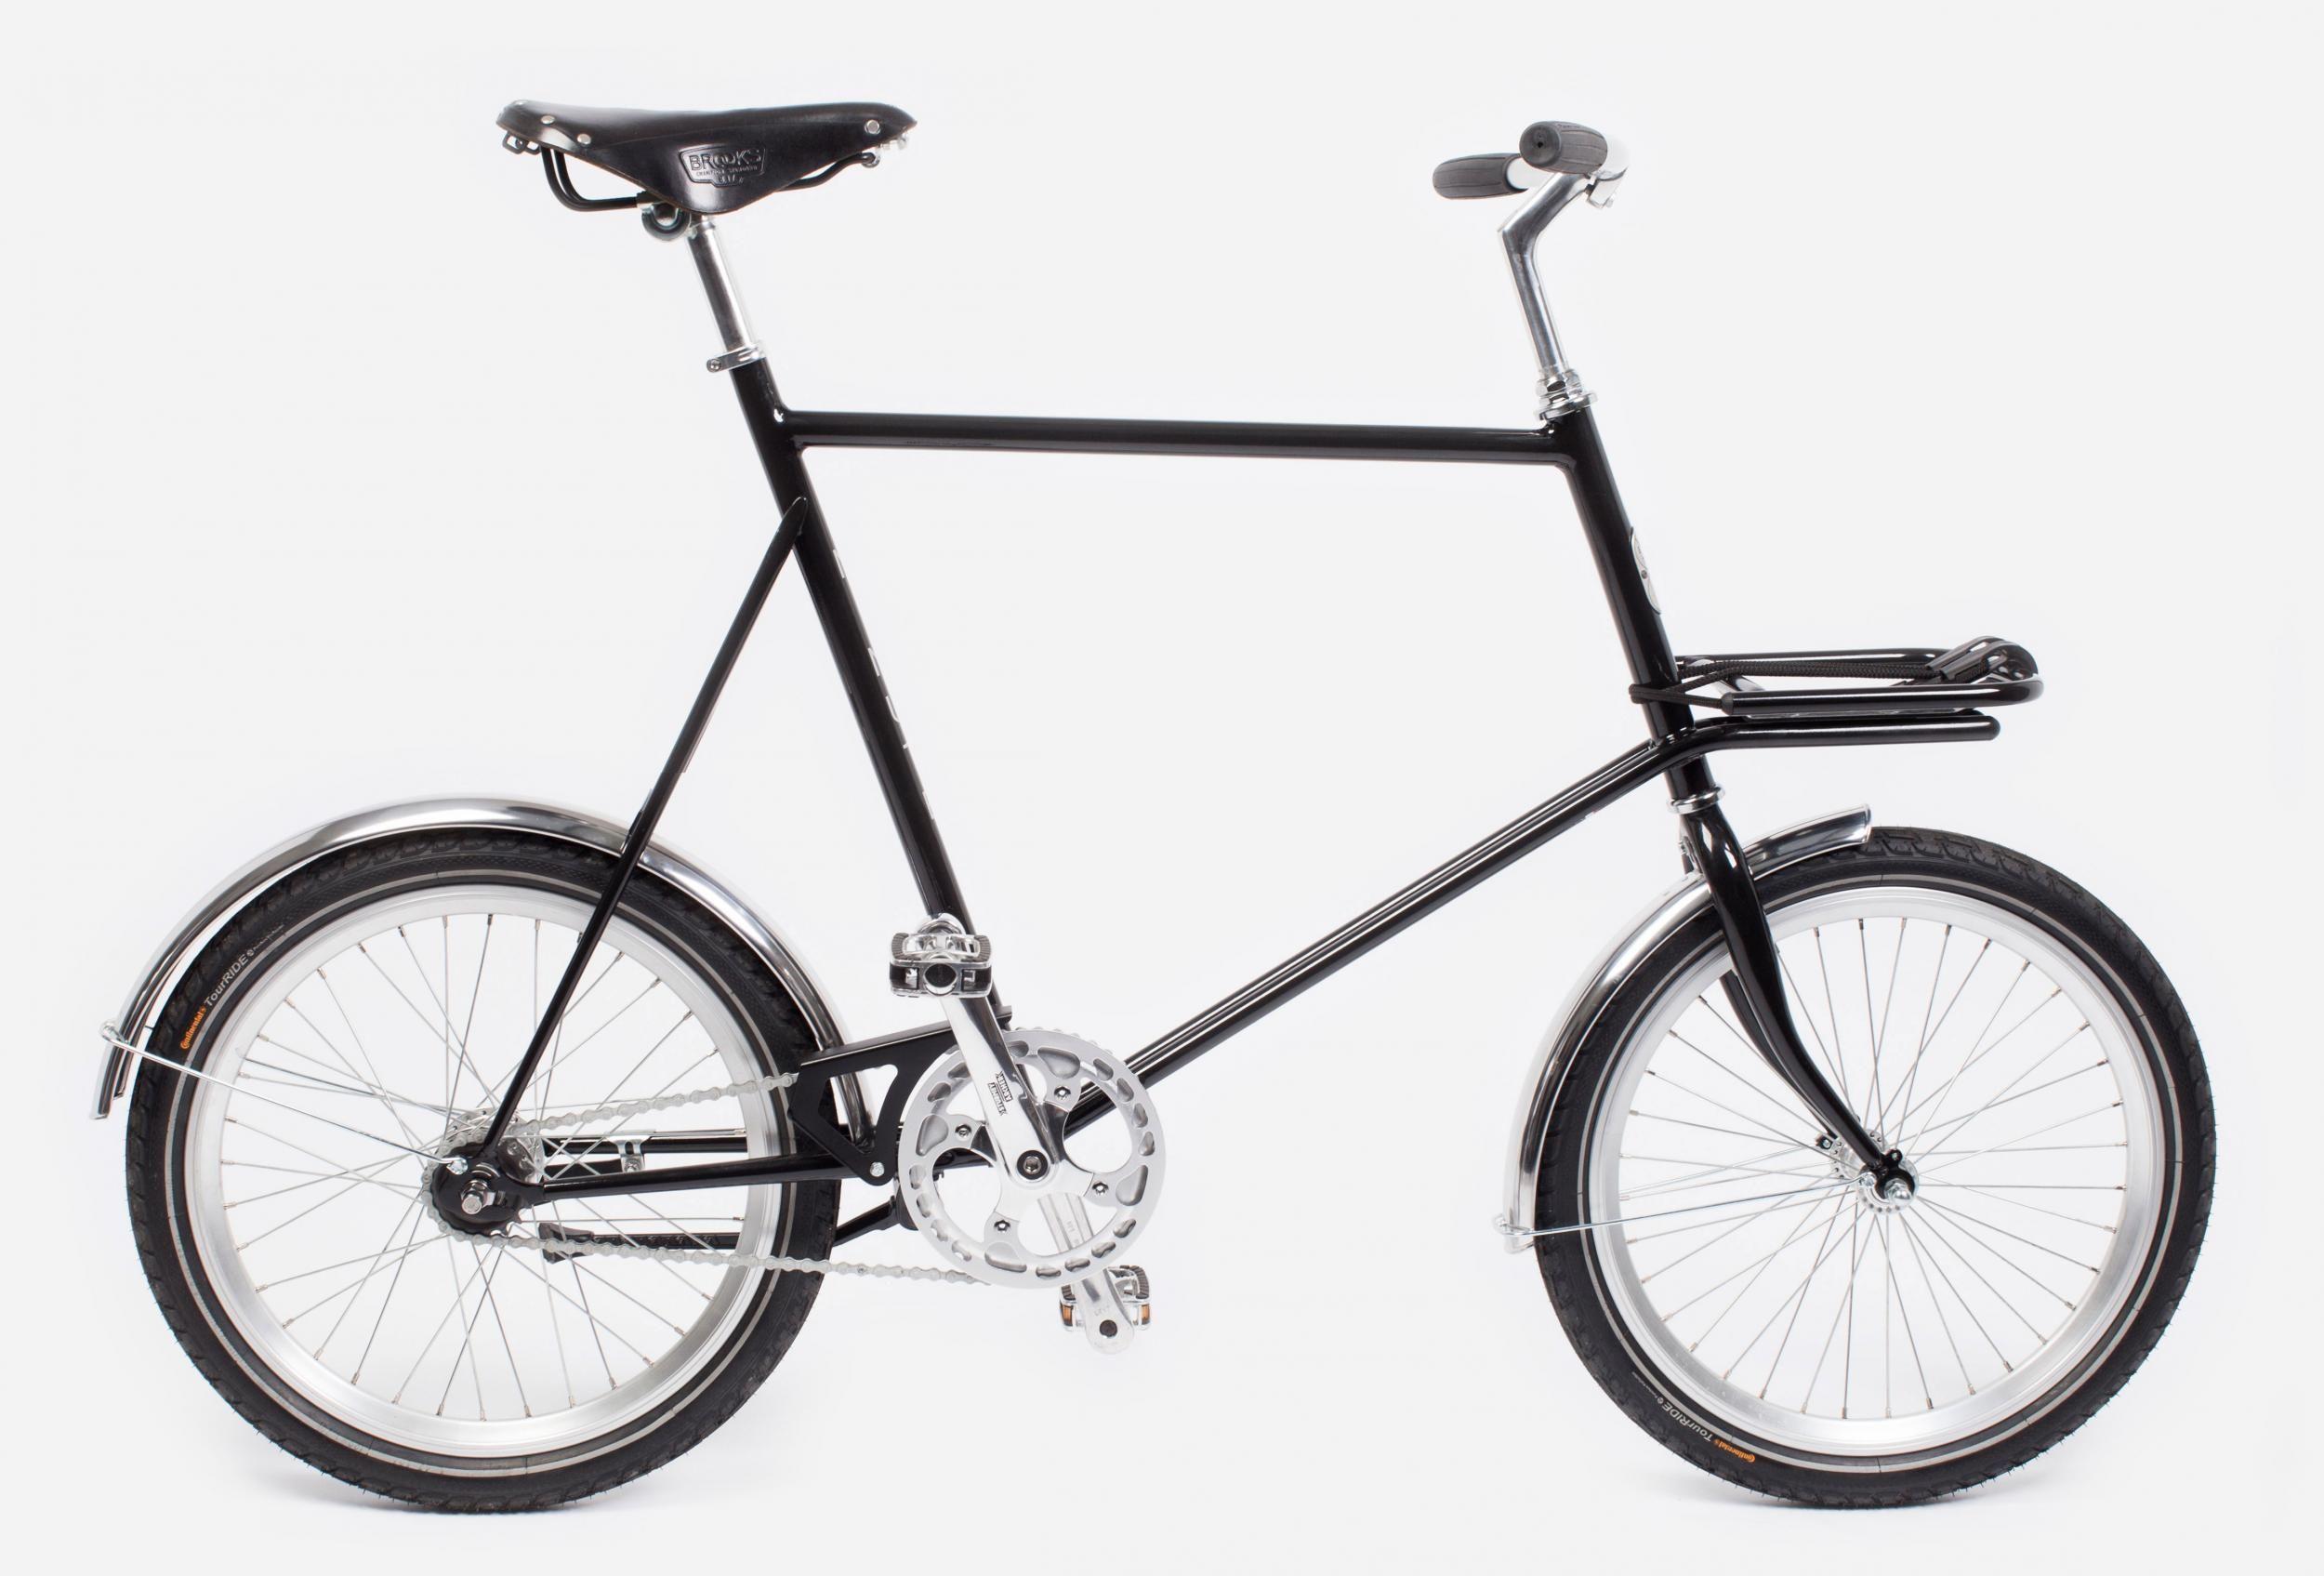 Mini Bike Tires